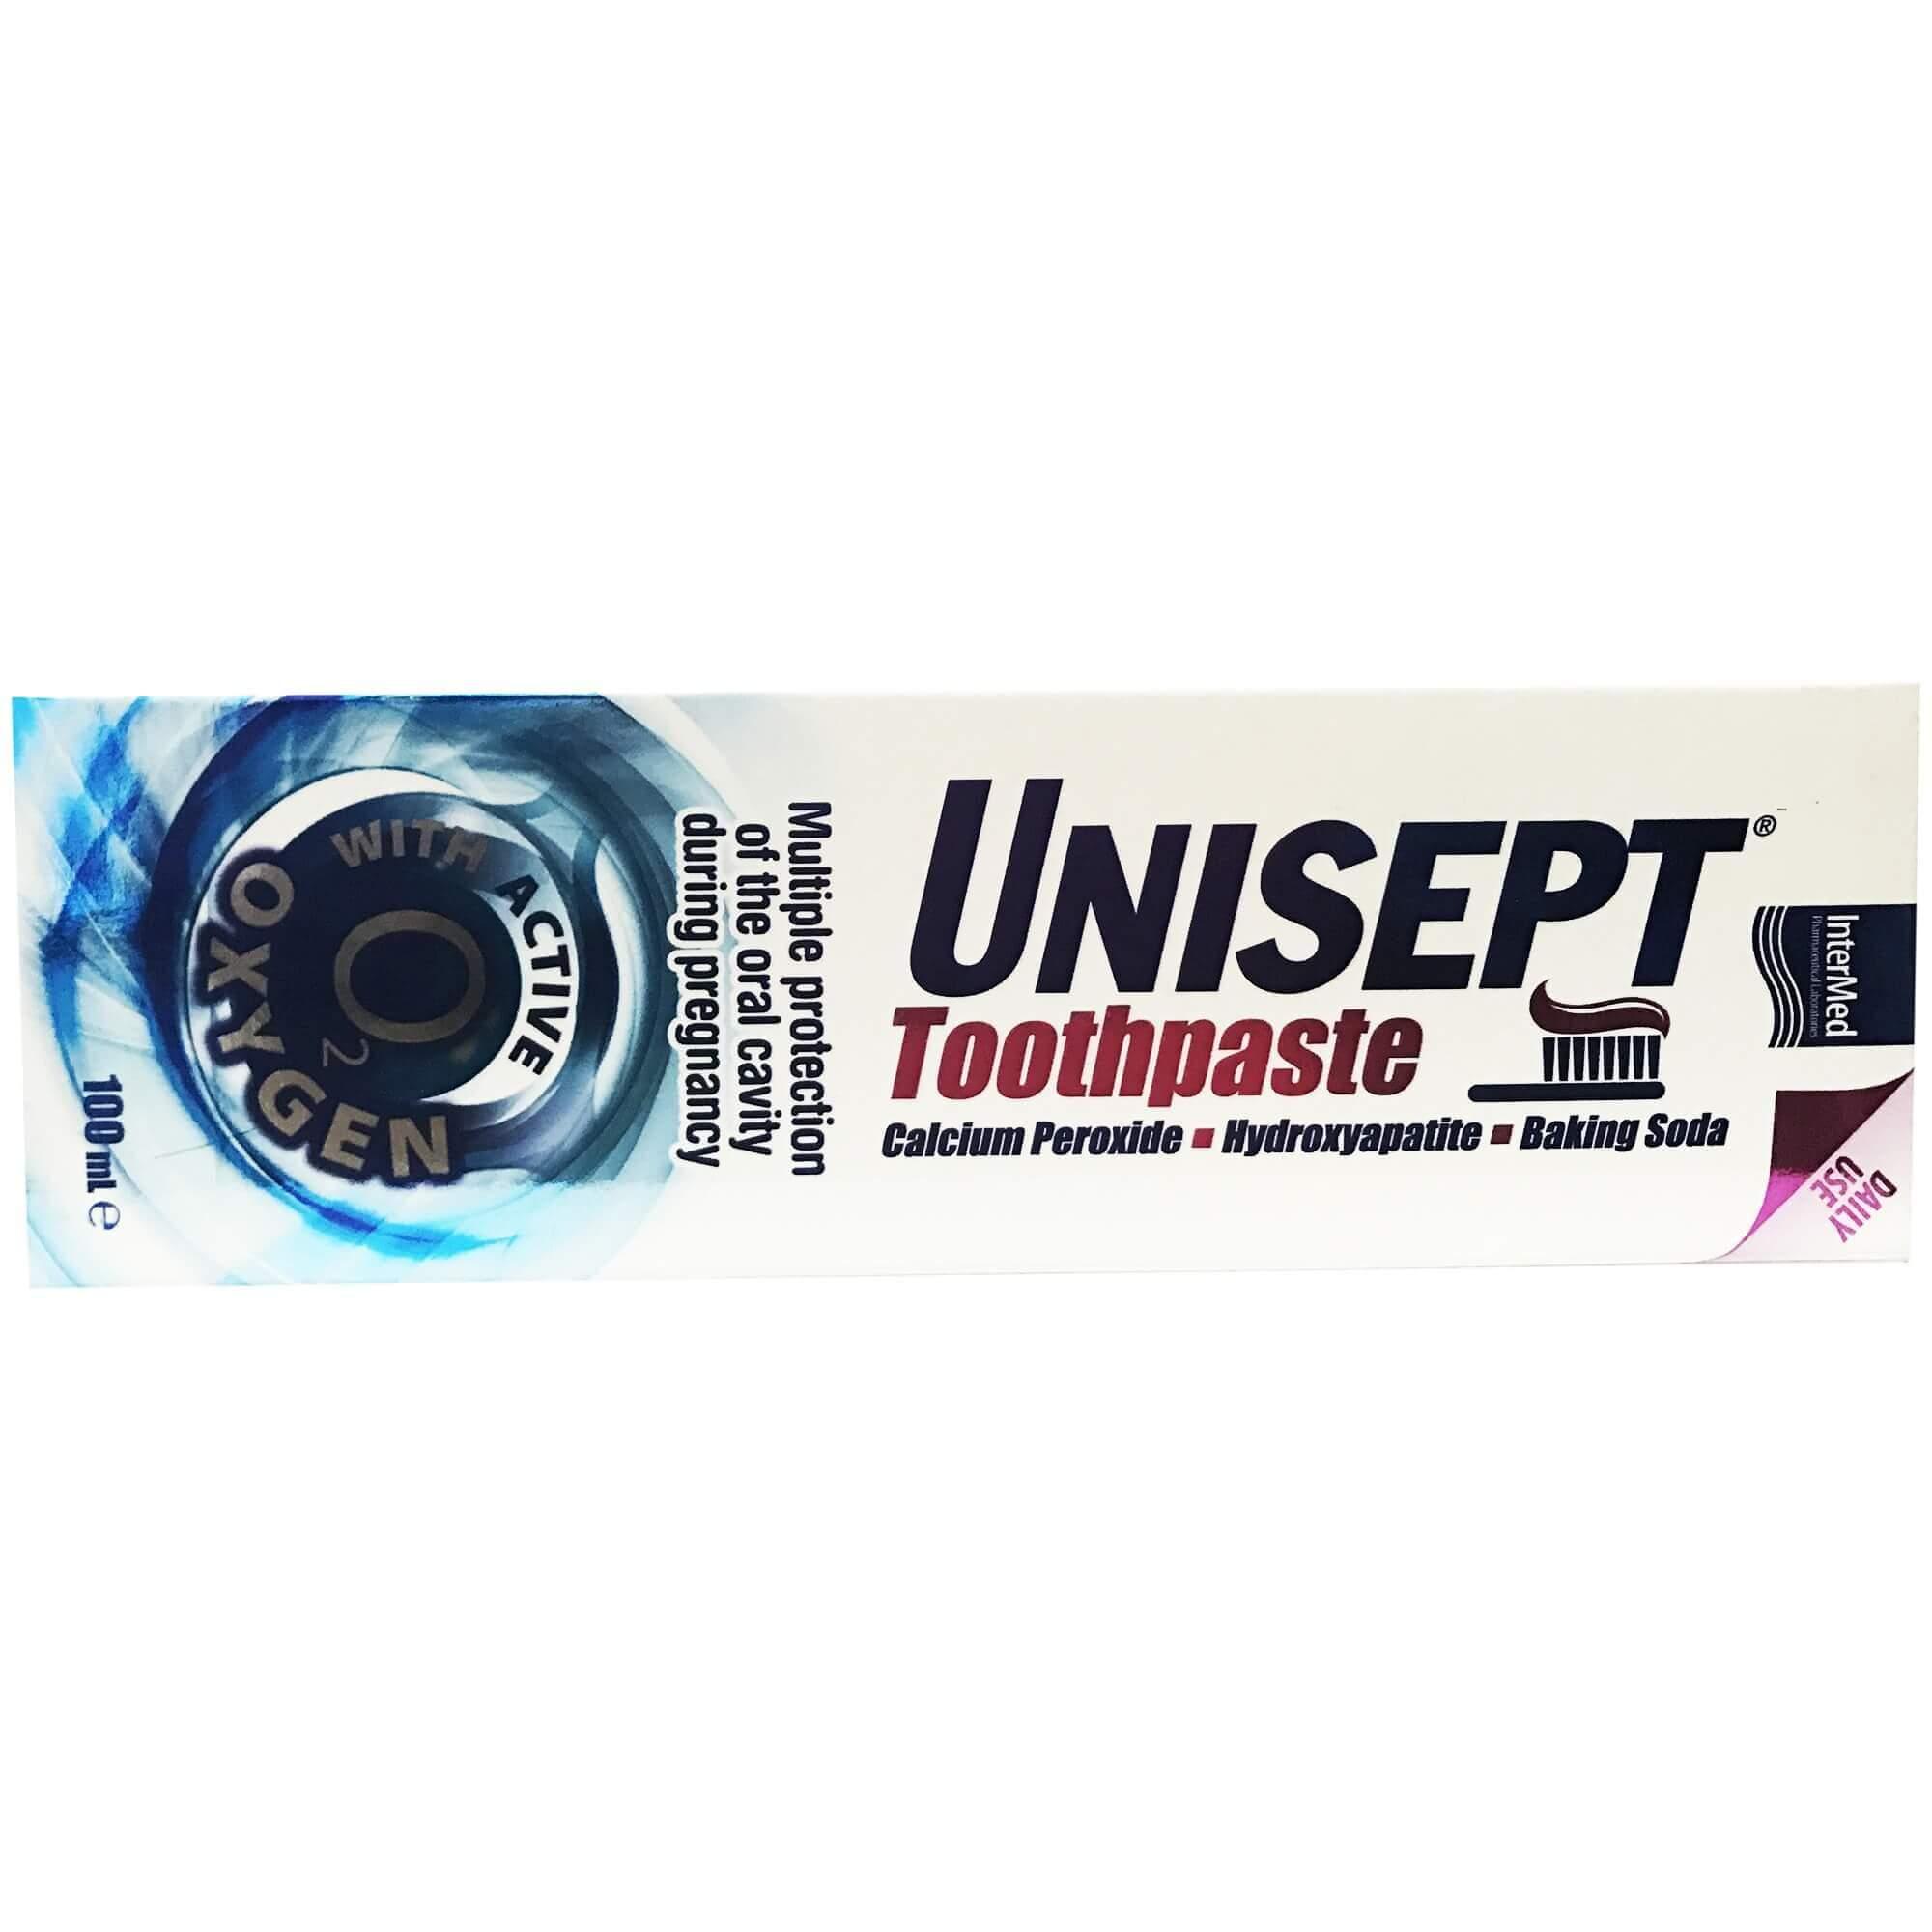 Intermed Unisept Toothpaste Οδοντόκρεμα Πολλαπλής Προστασίας Κατά τη Διάρκεια της Εγκυμοσύνης100ml